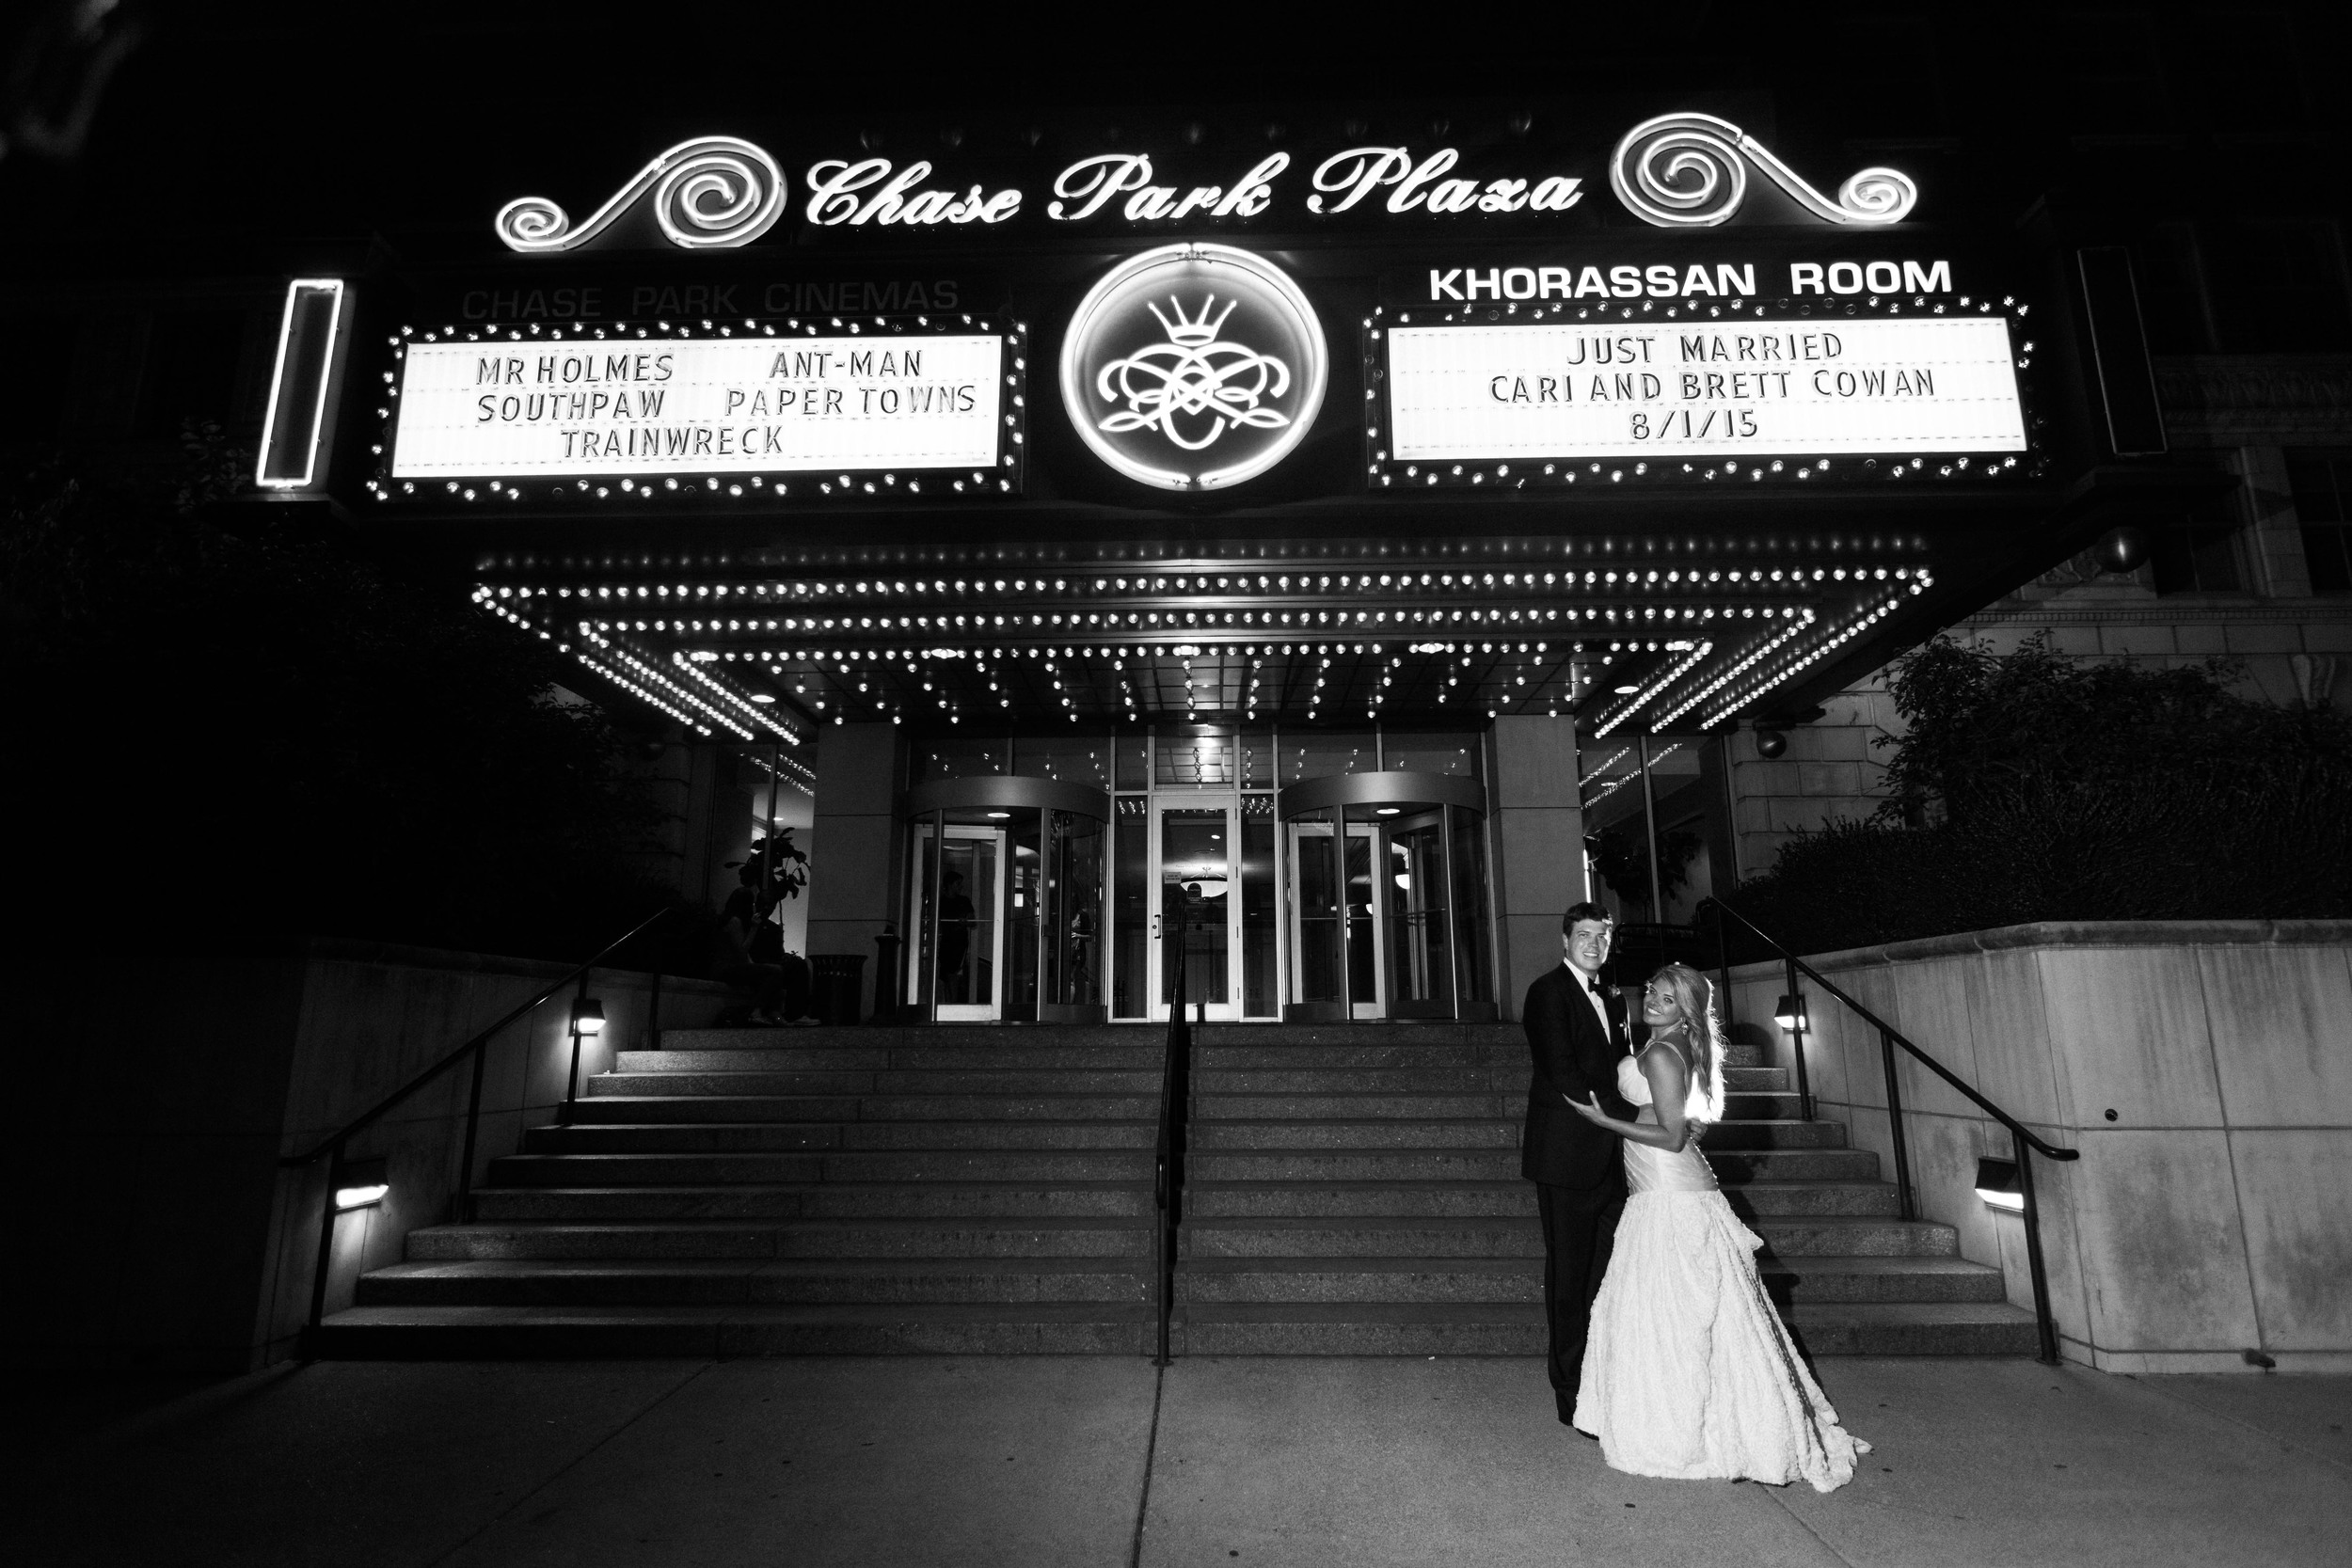 Chase Park Plaza St Louis Wedding Photo-1073.jpg